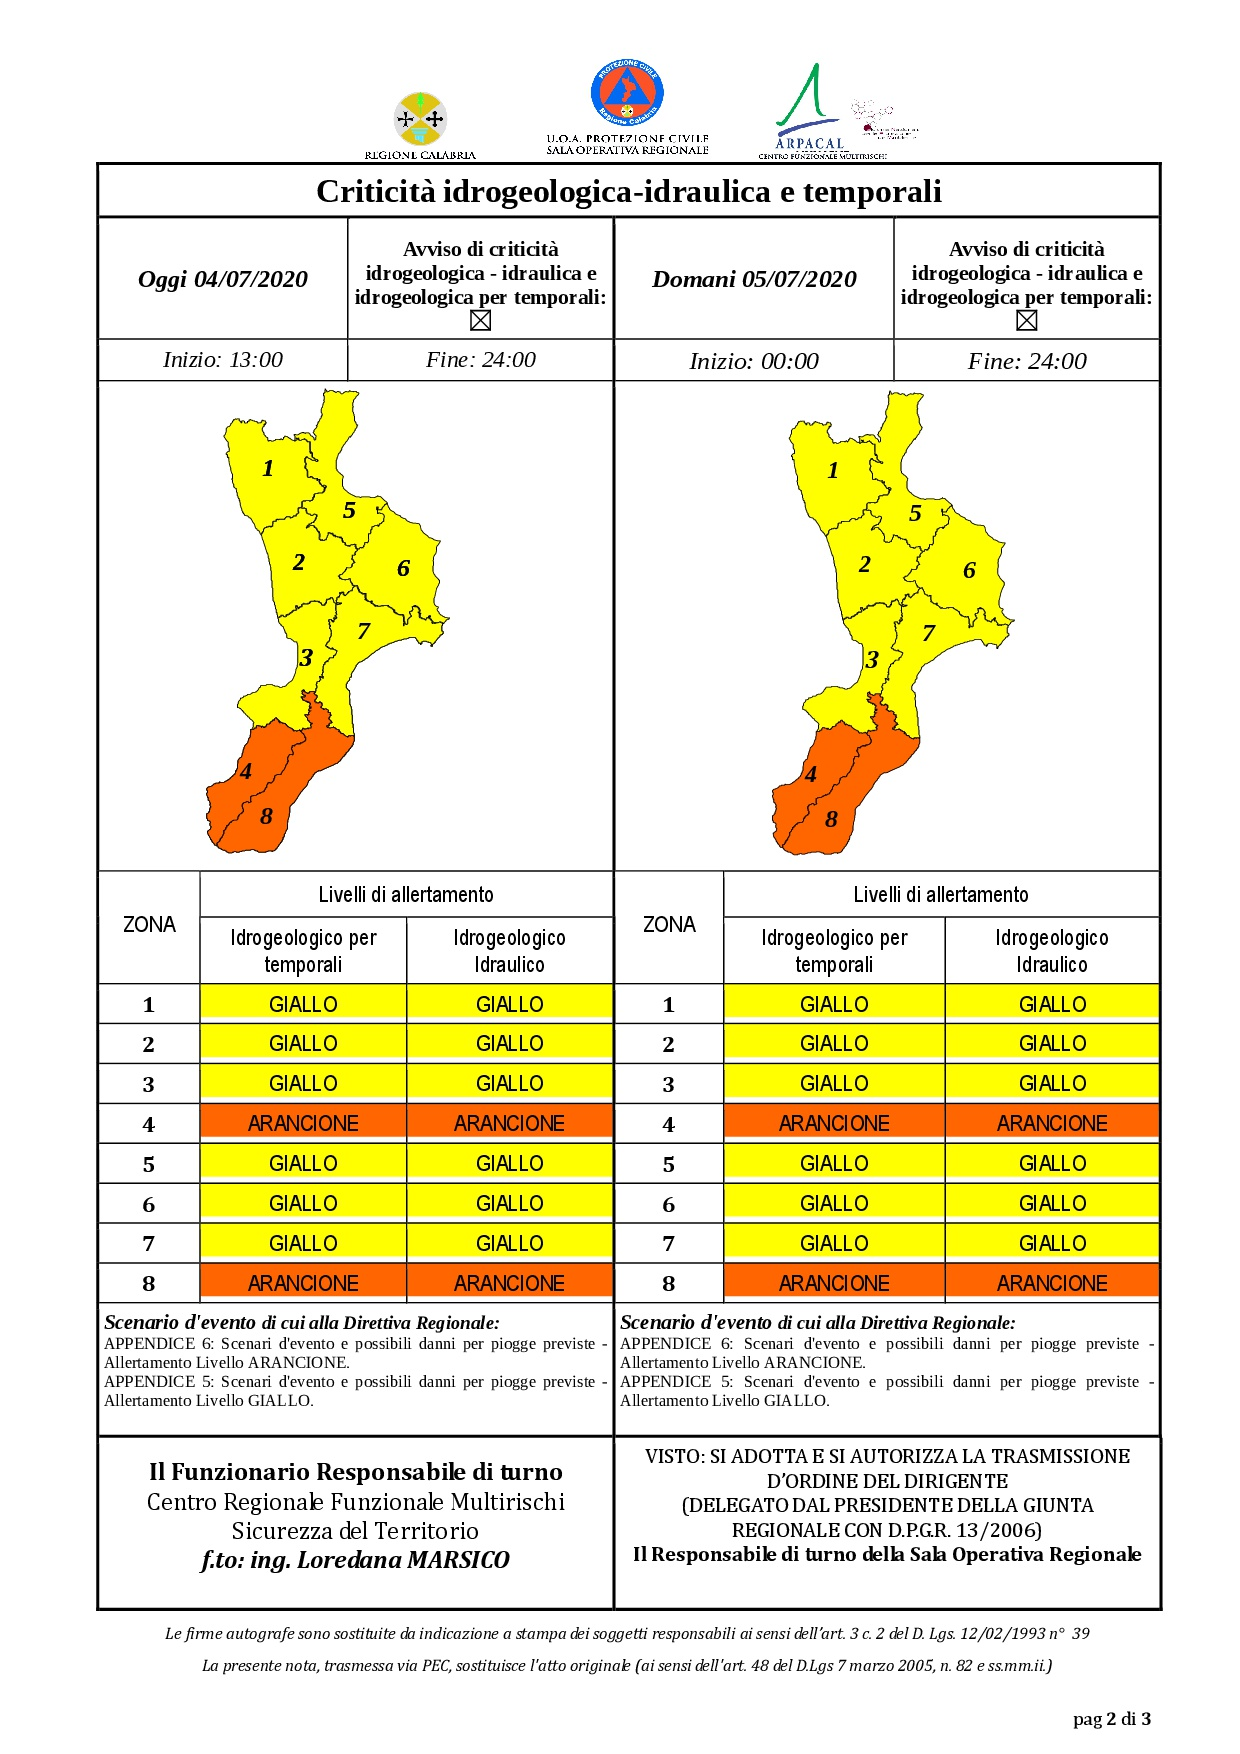 Criticità idrogeologica-idraulica e temporali in Calabria 04-07-2020